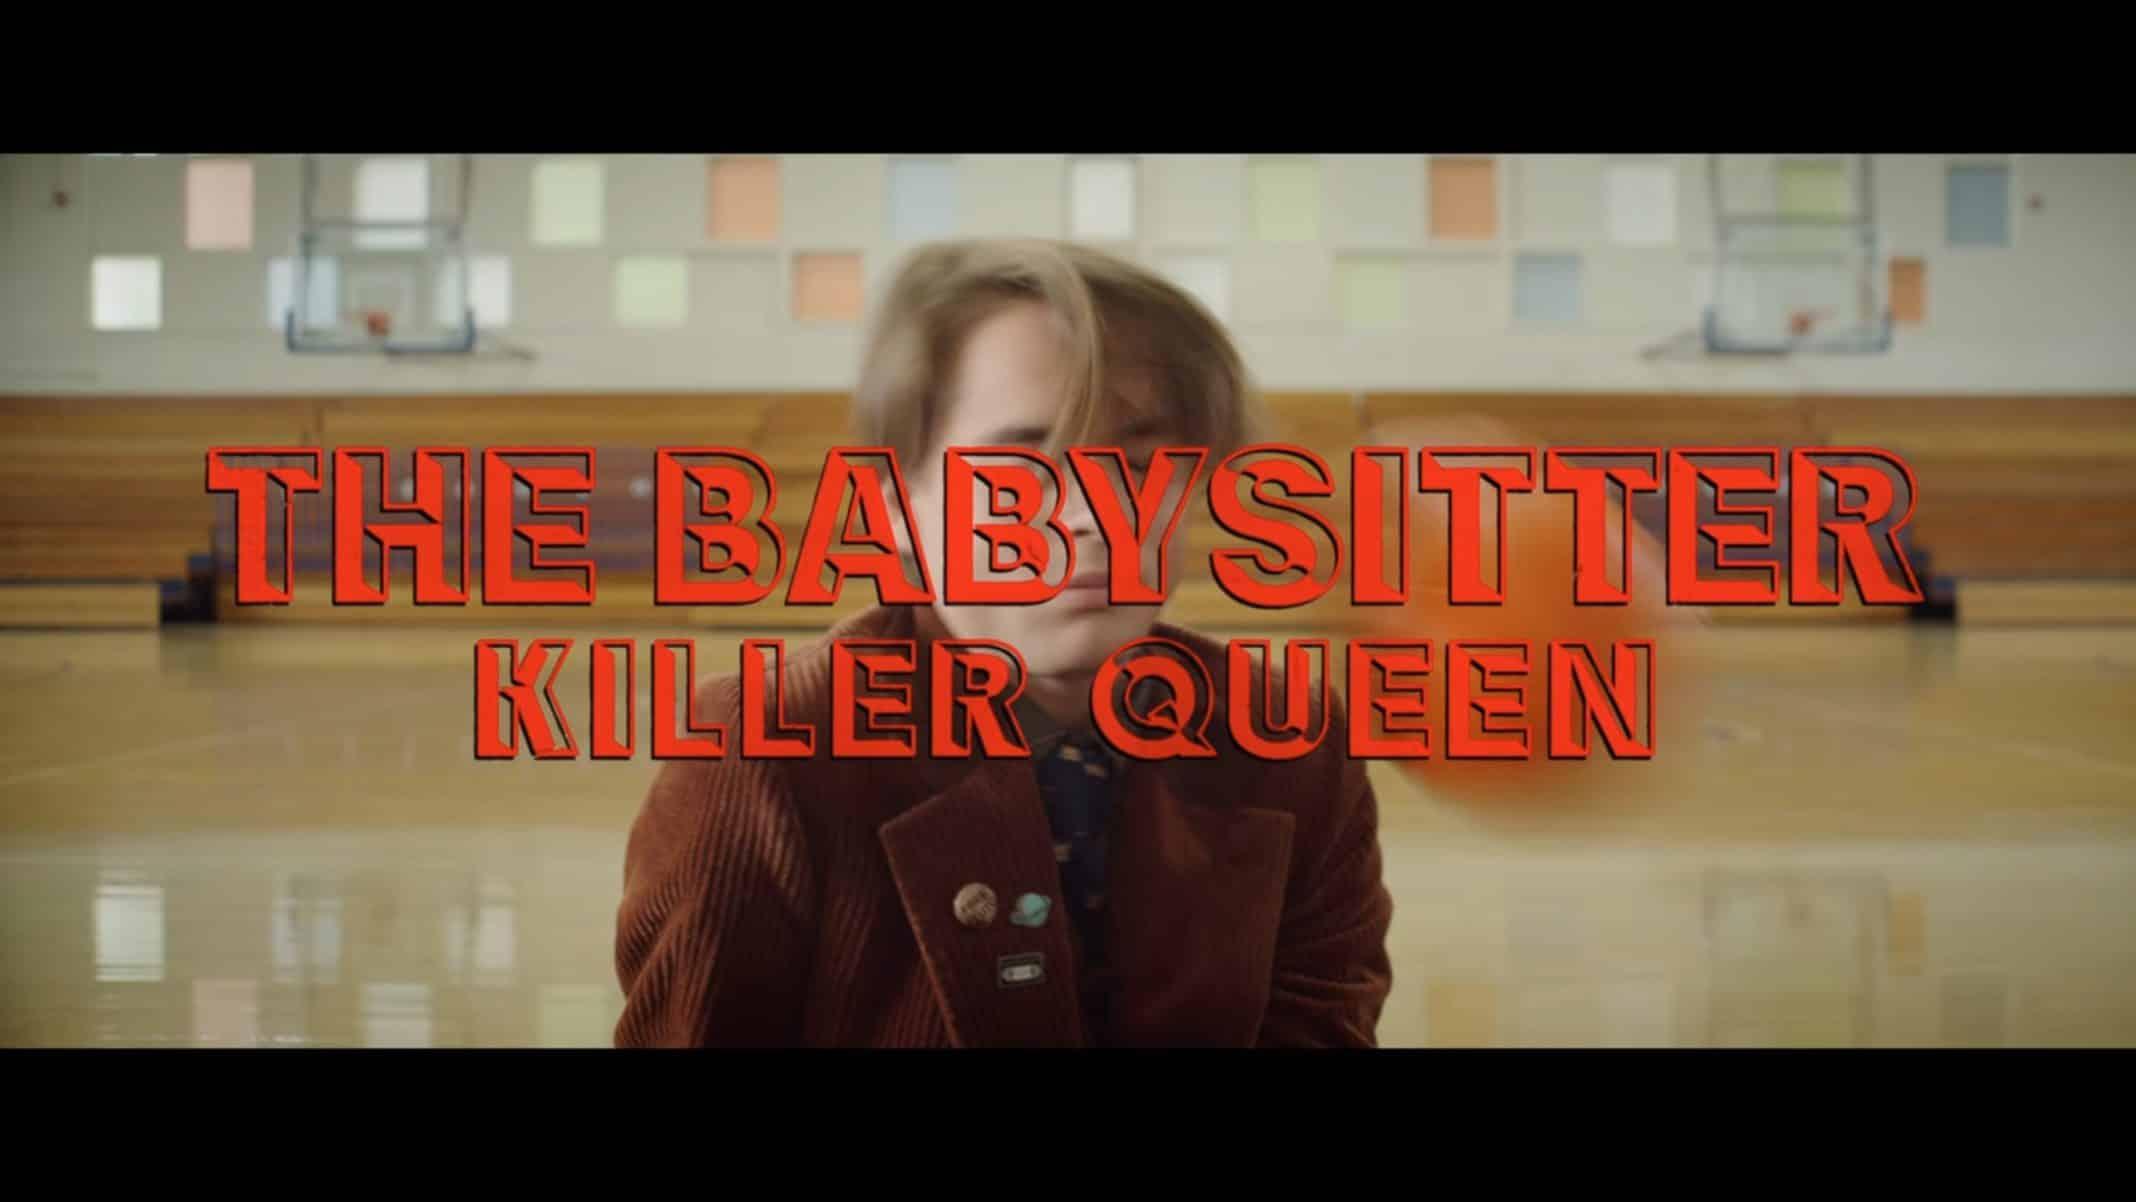 Title Card - The Babysitter Killer Queen